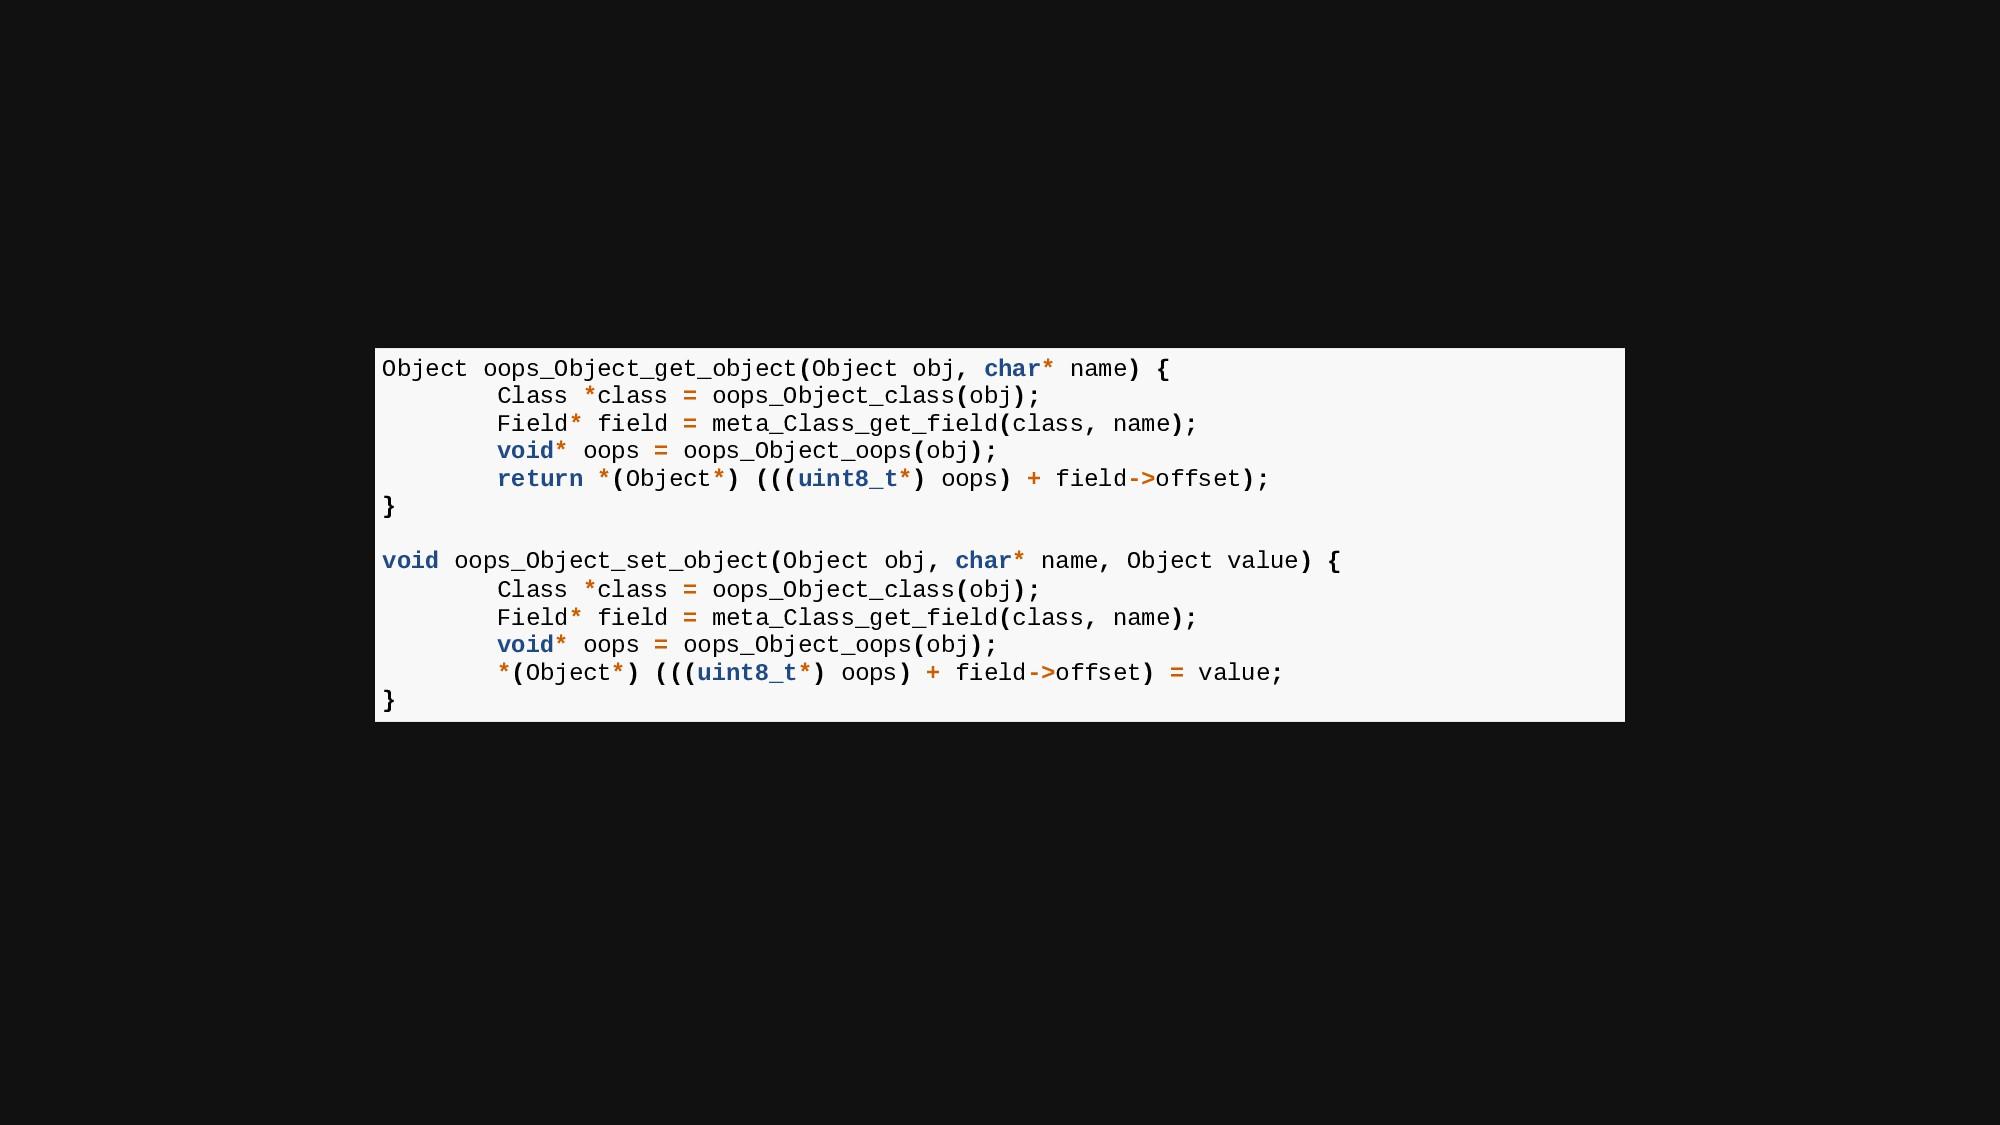 Object oops_Object_get_object(Object obj, char*...